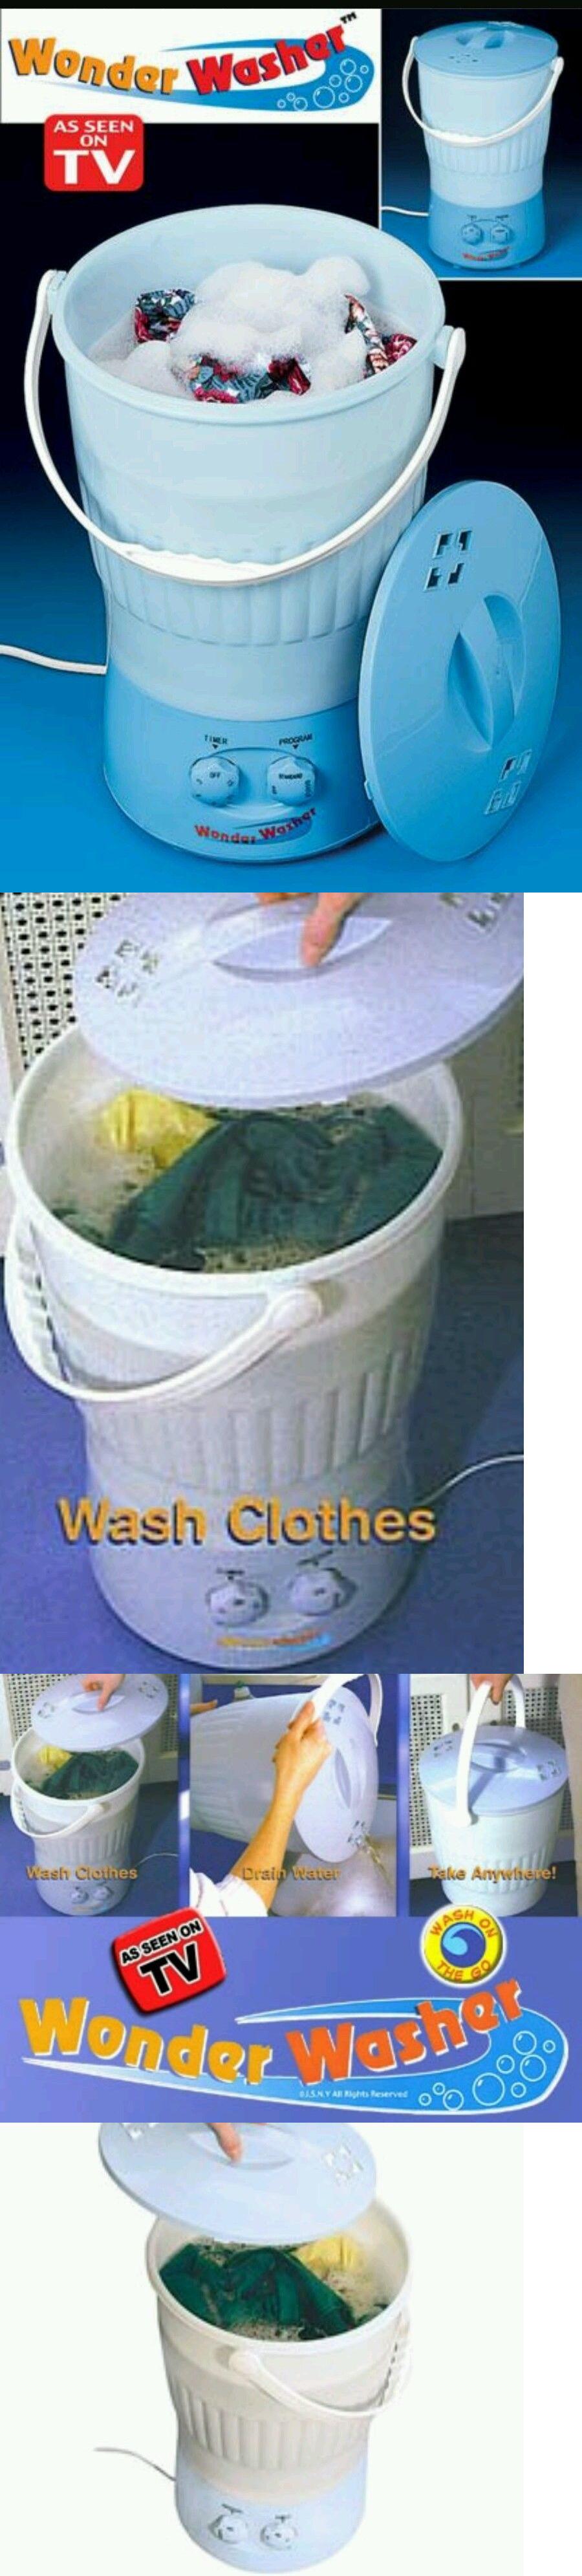 Travel Washing Machine Other Laundry Supplies 20624 Wonder Washer Portable Washing